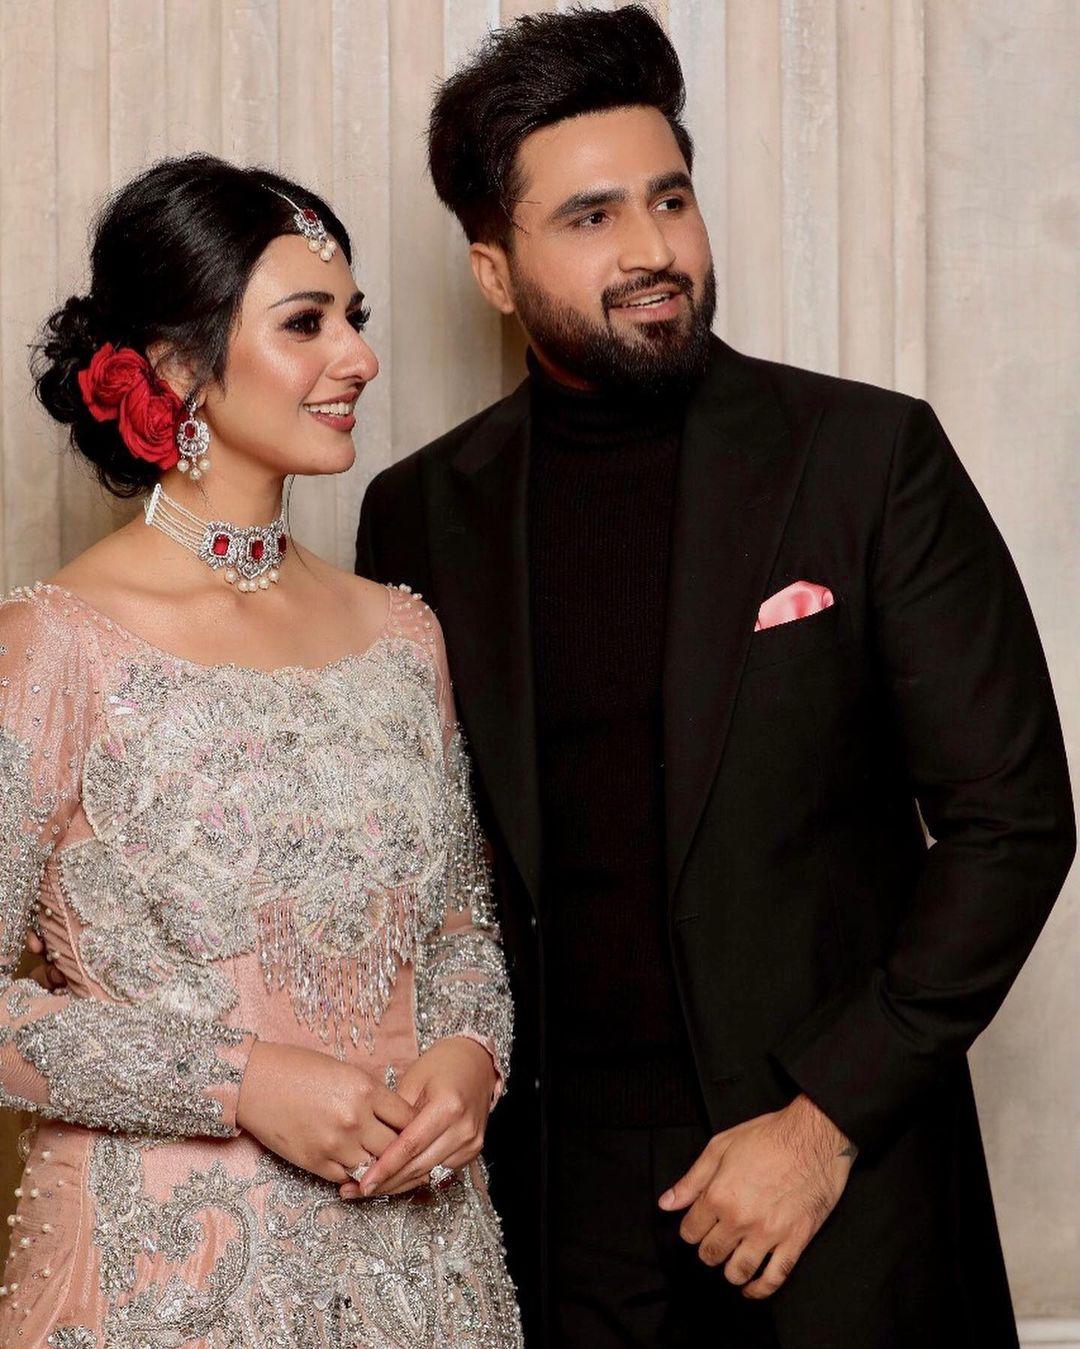 New Adorable Pictures of Sarah Khan and Falak Shabir